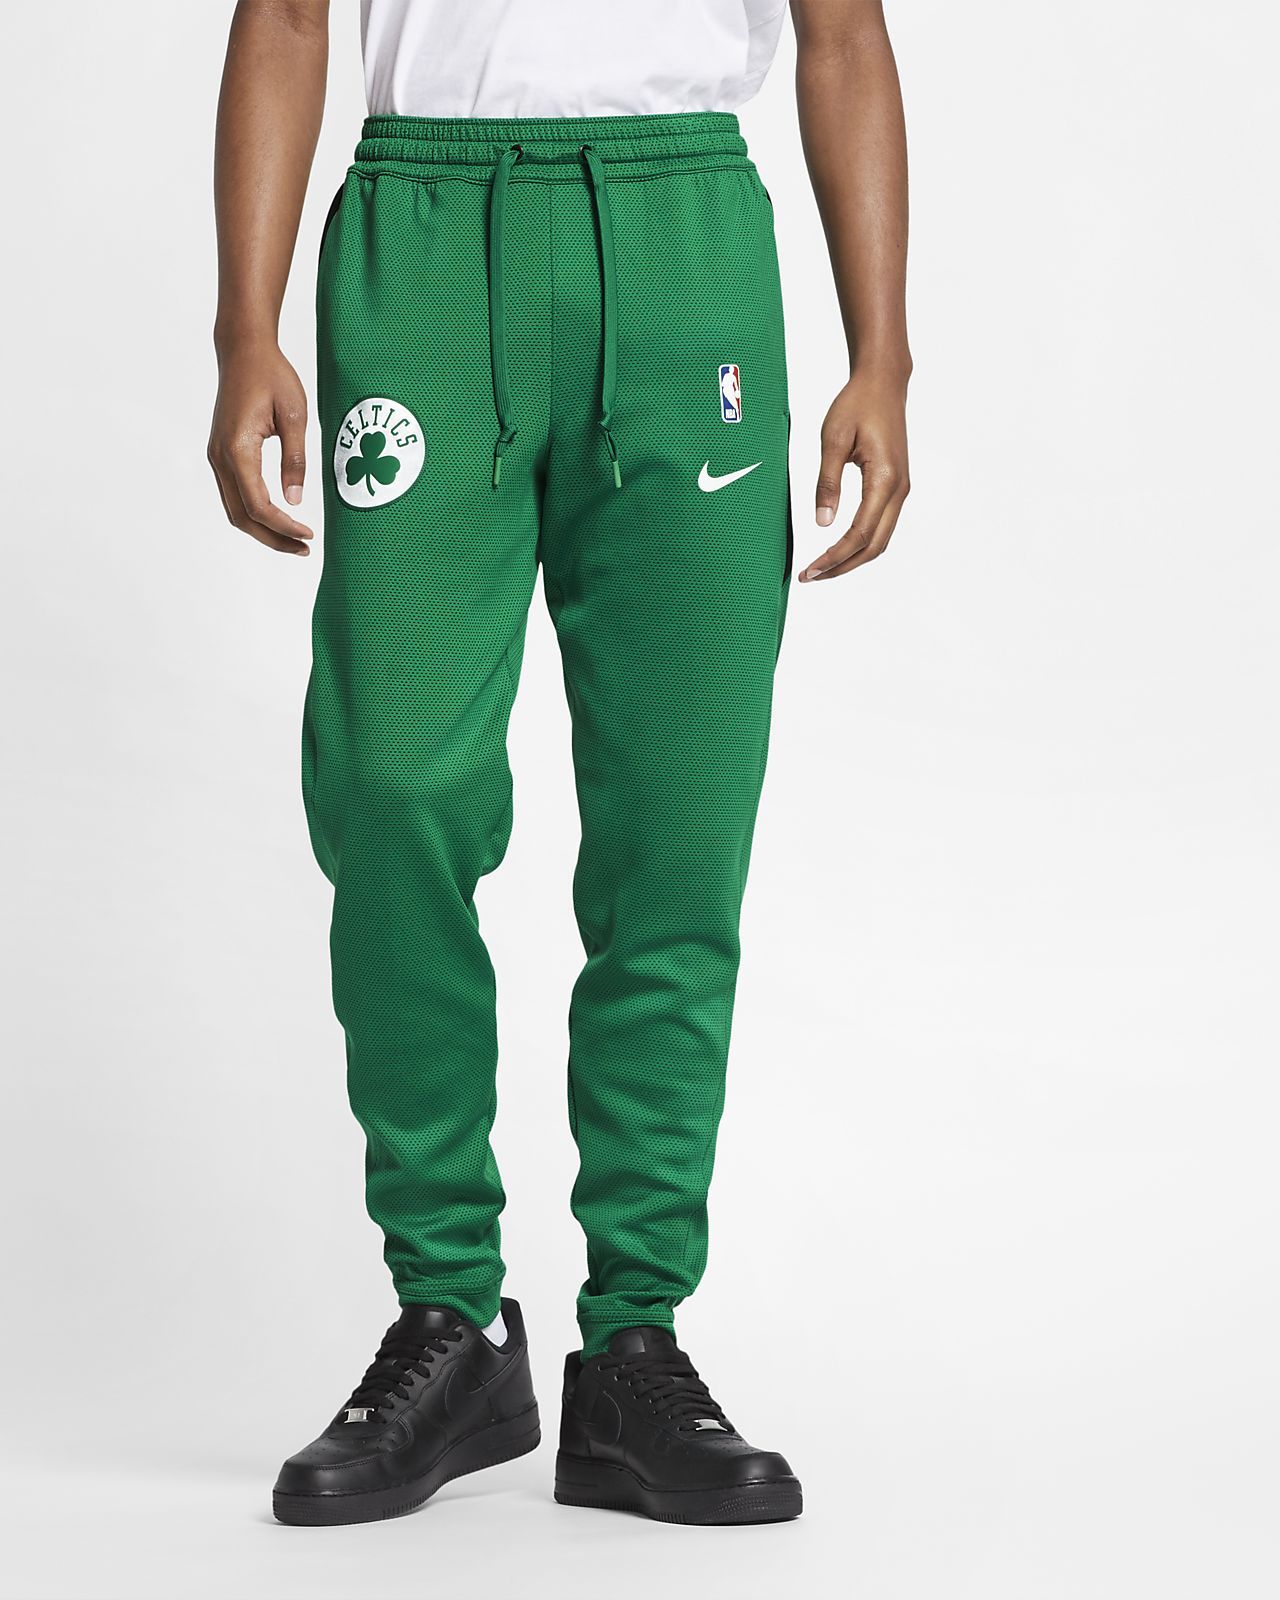 Nike Therma Fit da Ragazzo Lebron James Pantaloni Athletic